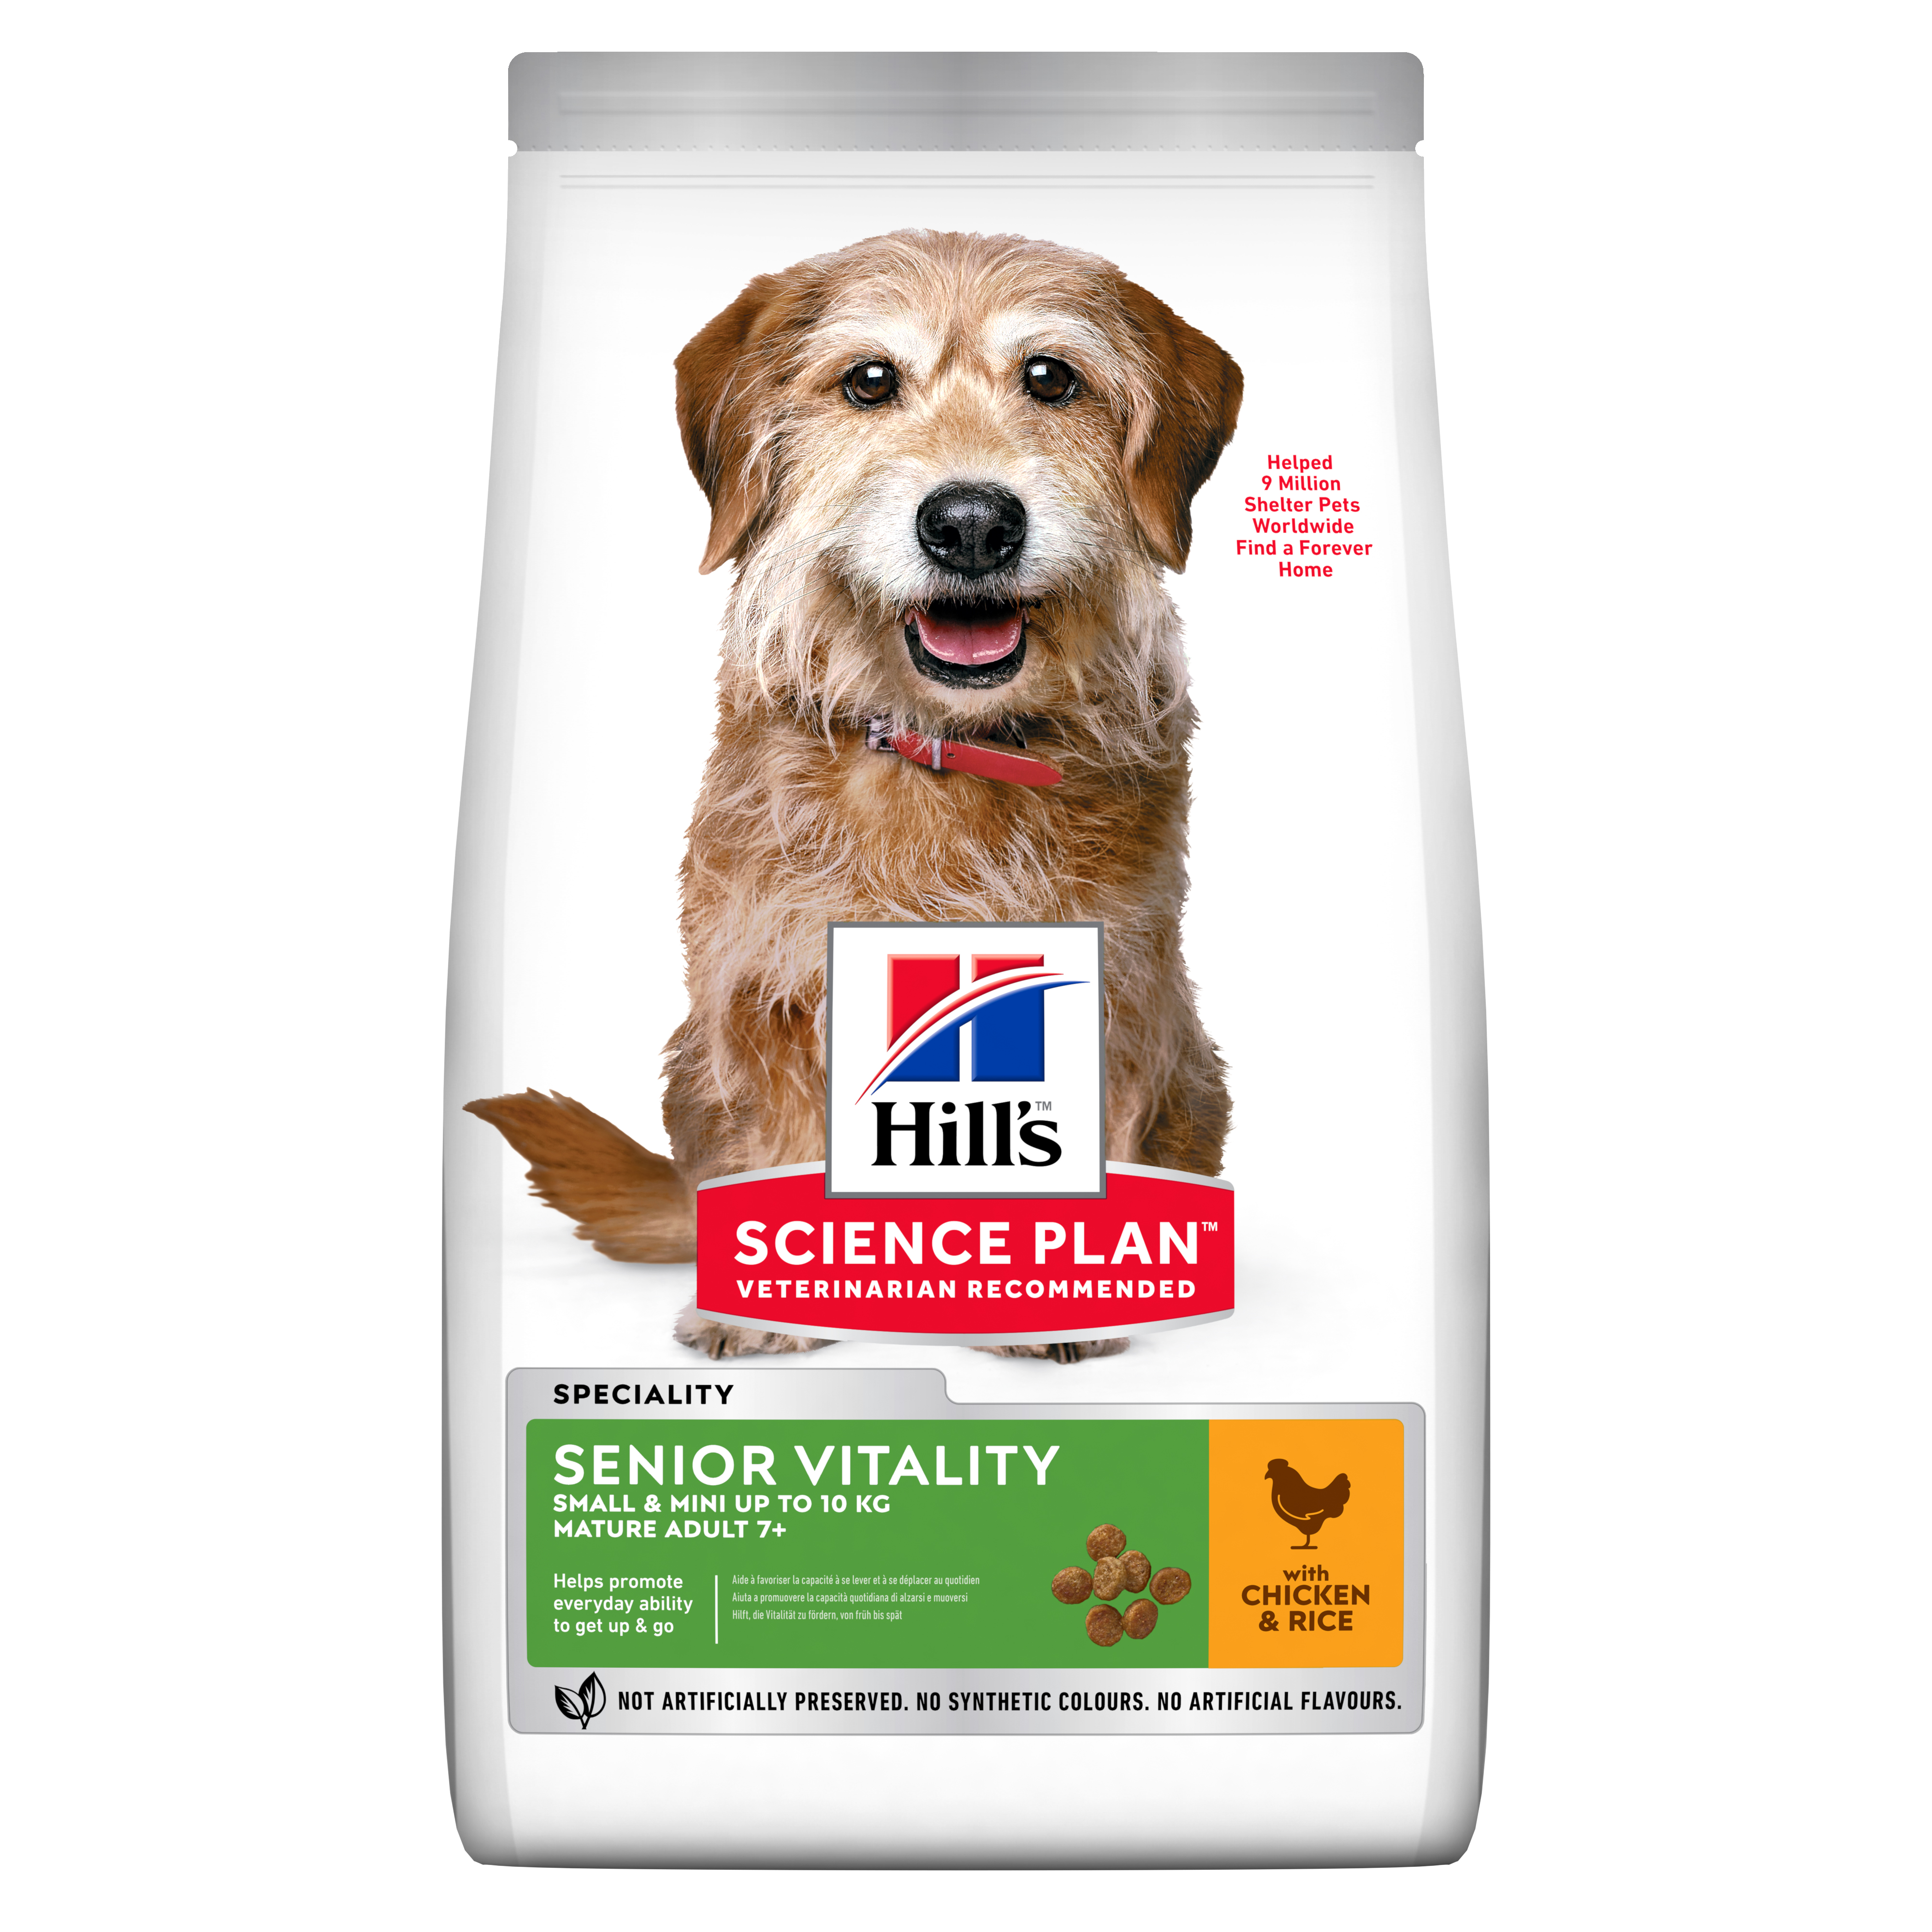 Senior Vitality Small & Mini Mature Adult 7+ hundfoder med kyckling & ris